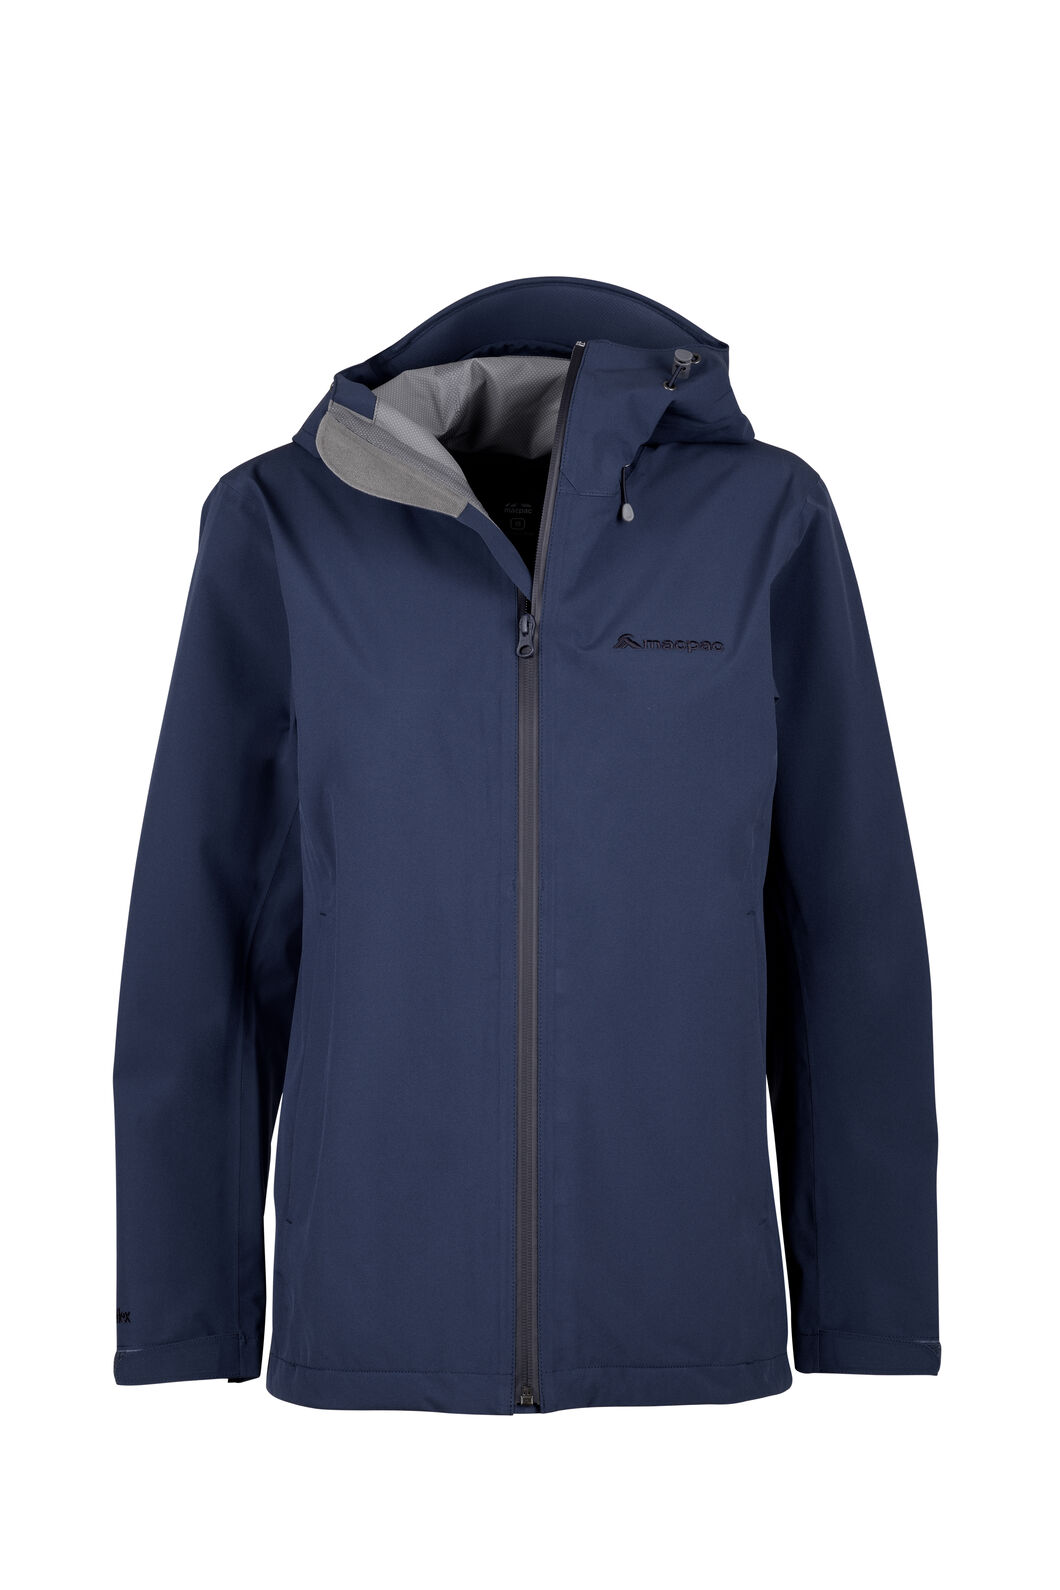 Macpac Dispatch Rain Jacket - Women's, Black Iris, hi-res